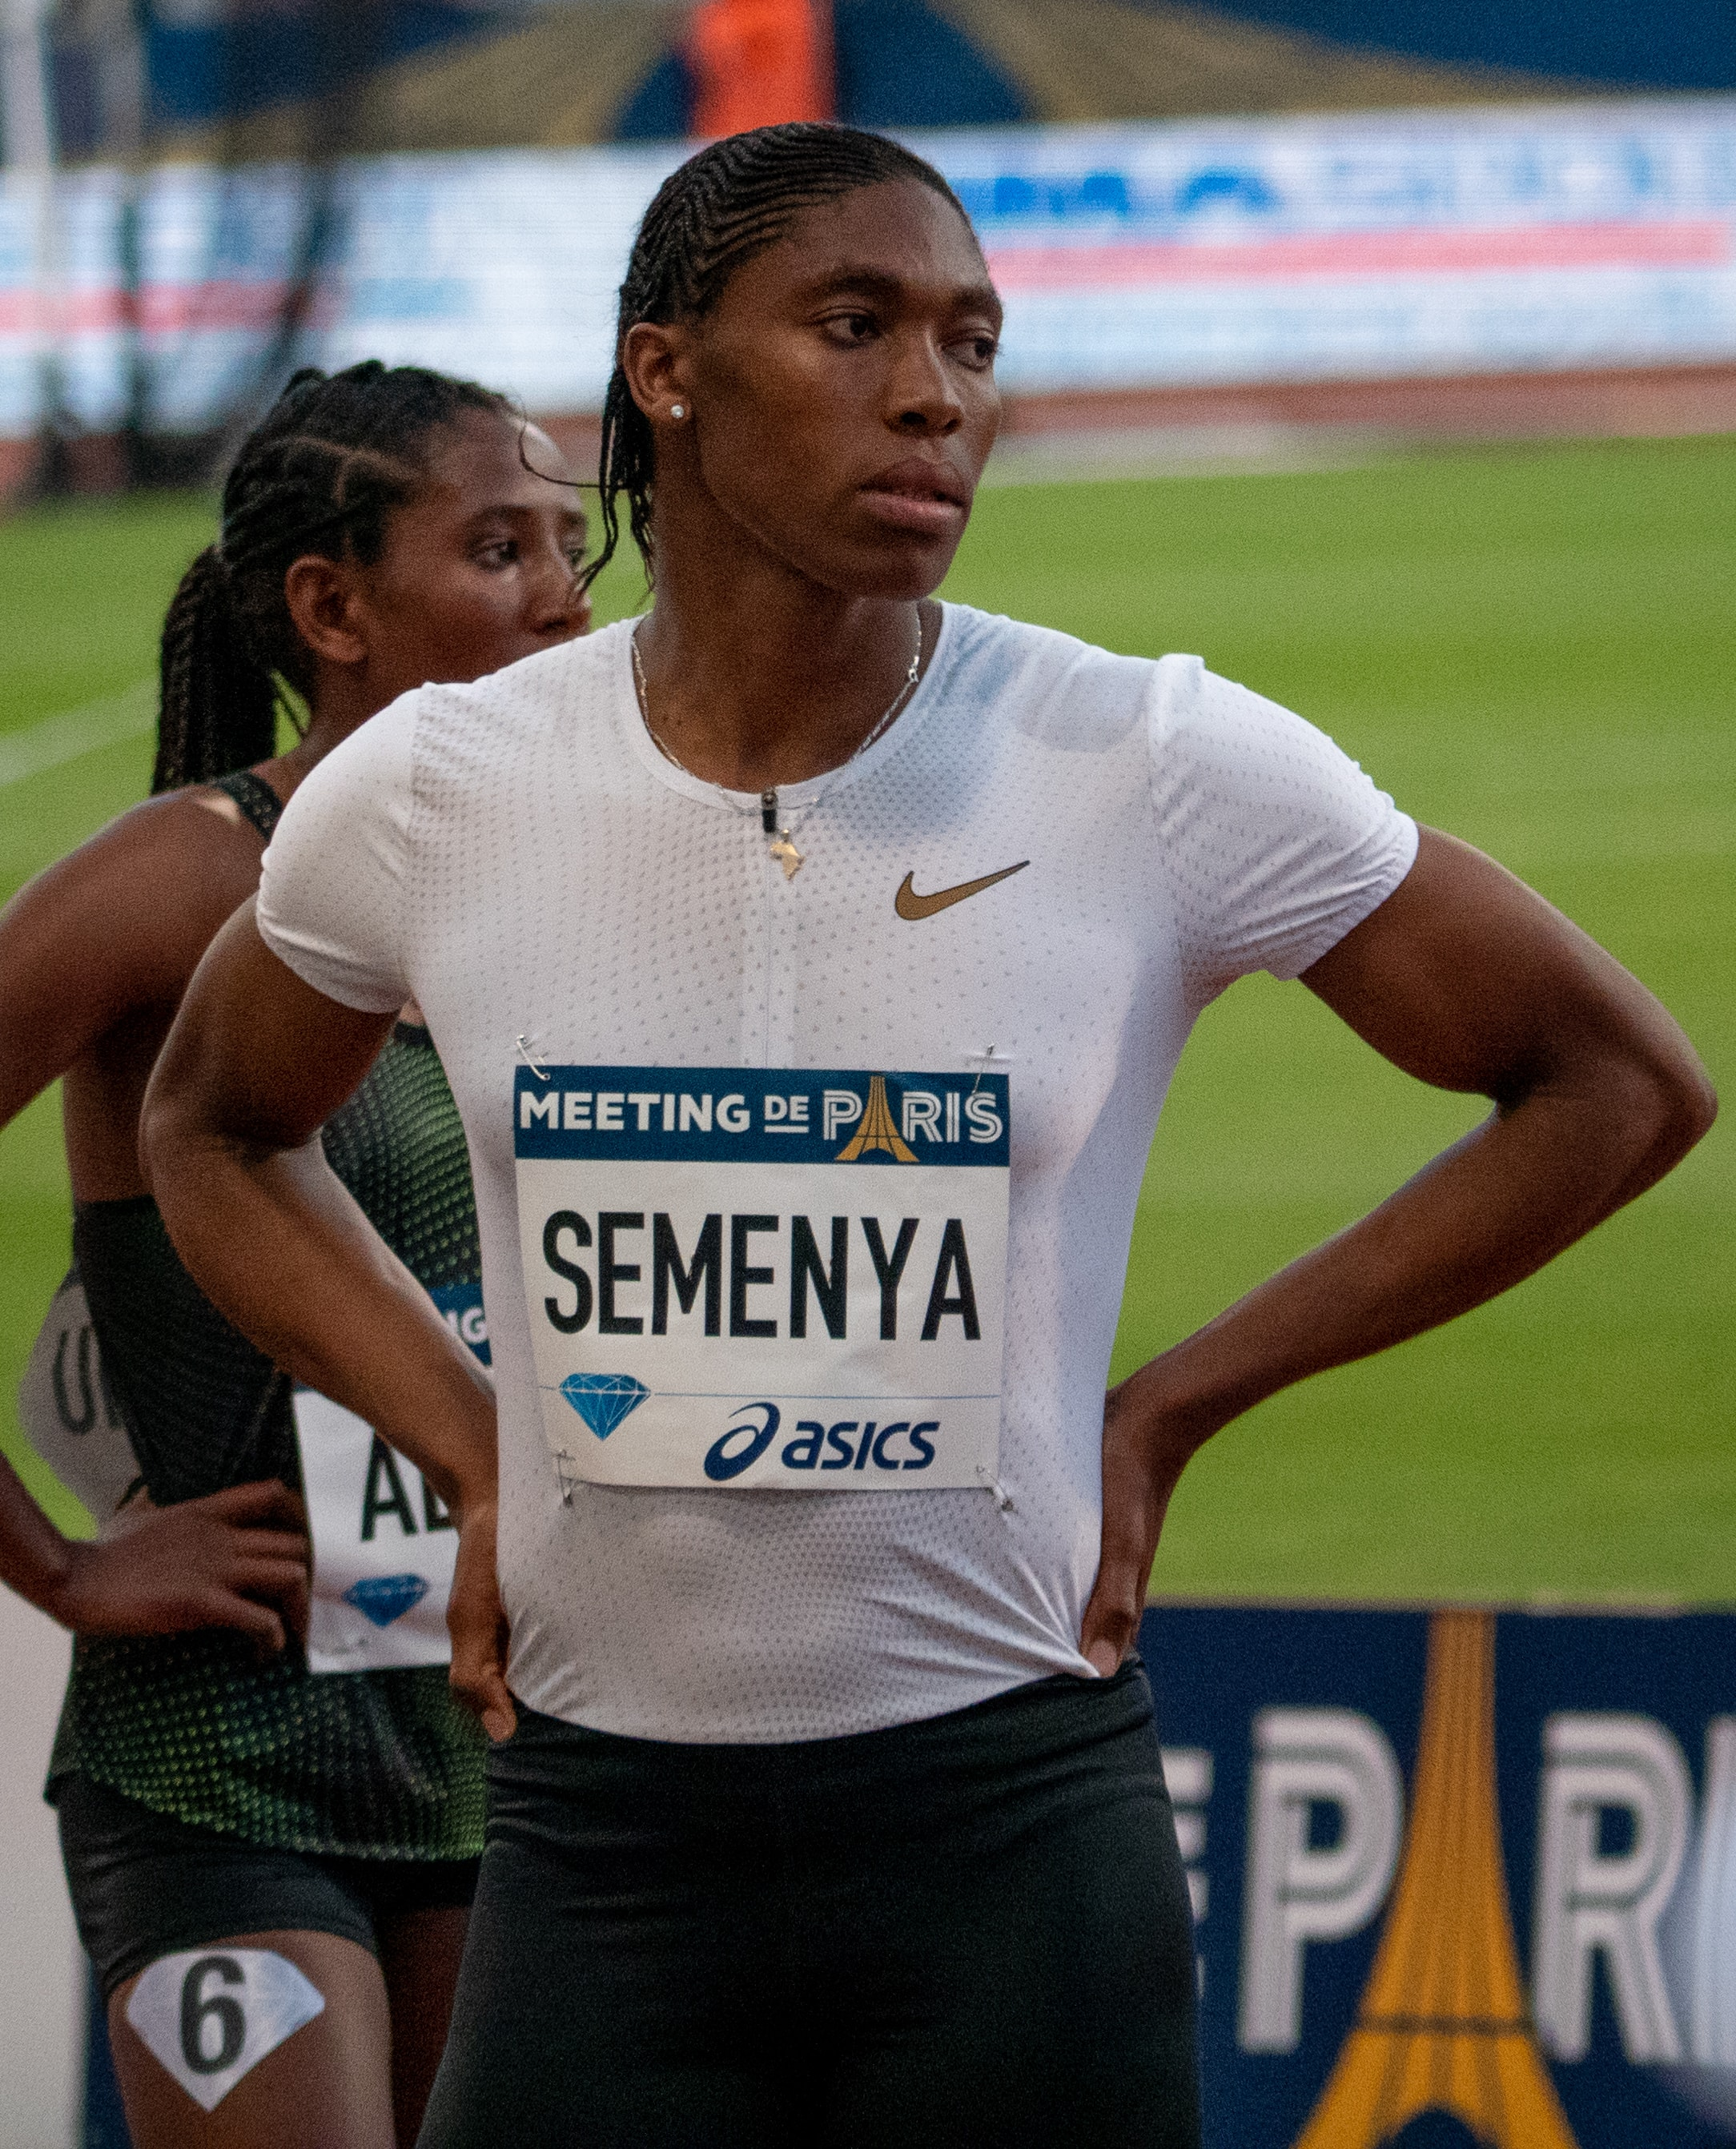 Athletics-Semenya receives 'late' invite to Morocco race -agent